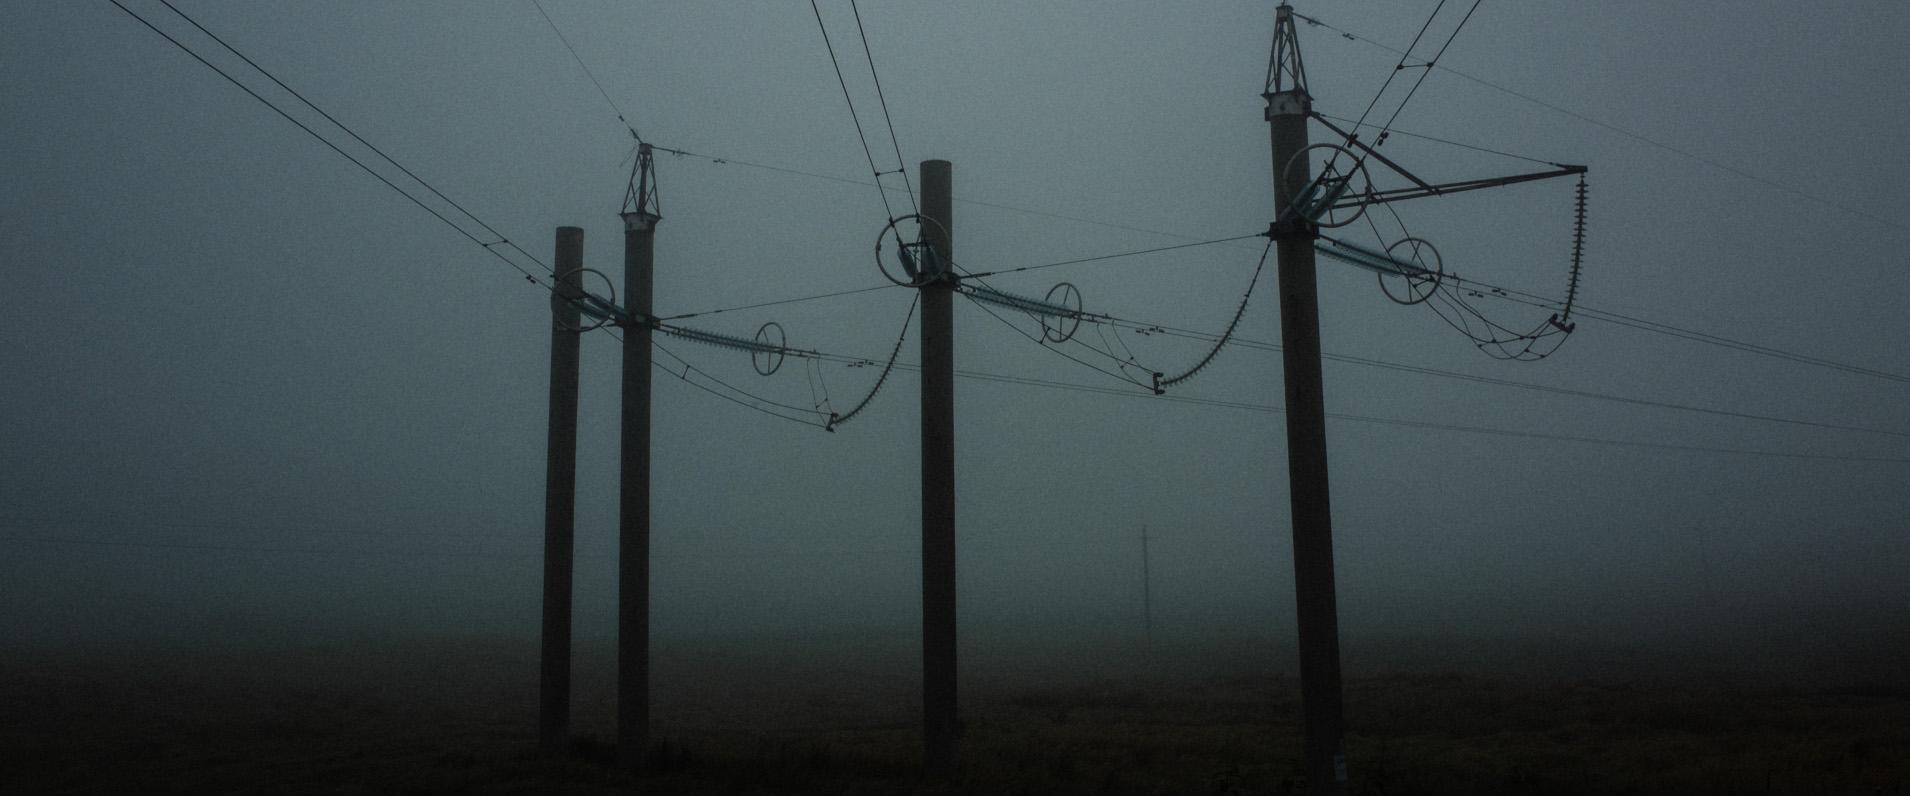 electricity by jevgenij tichonov.jpg